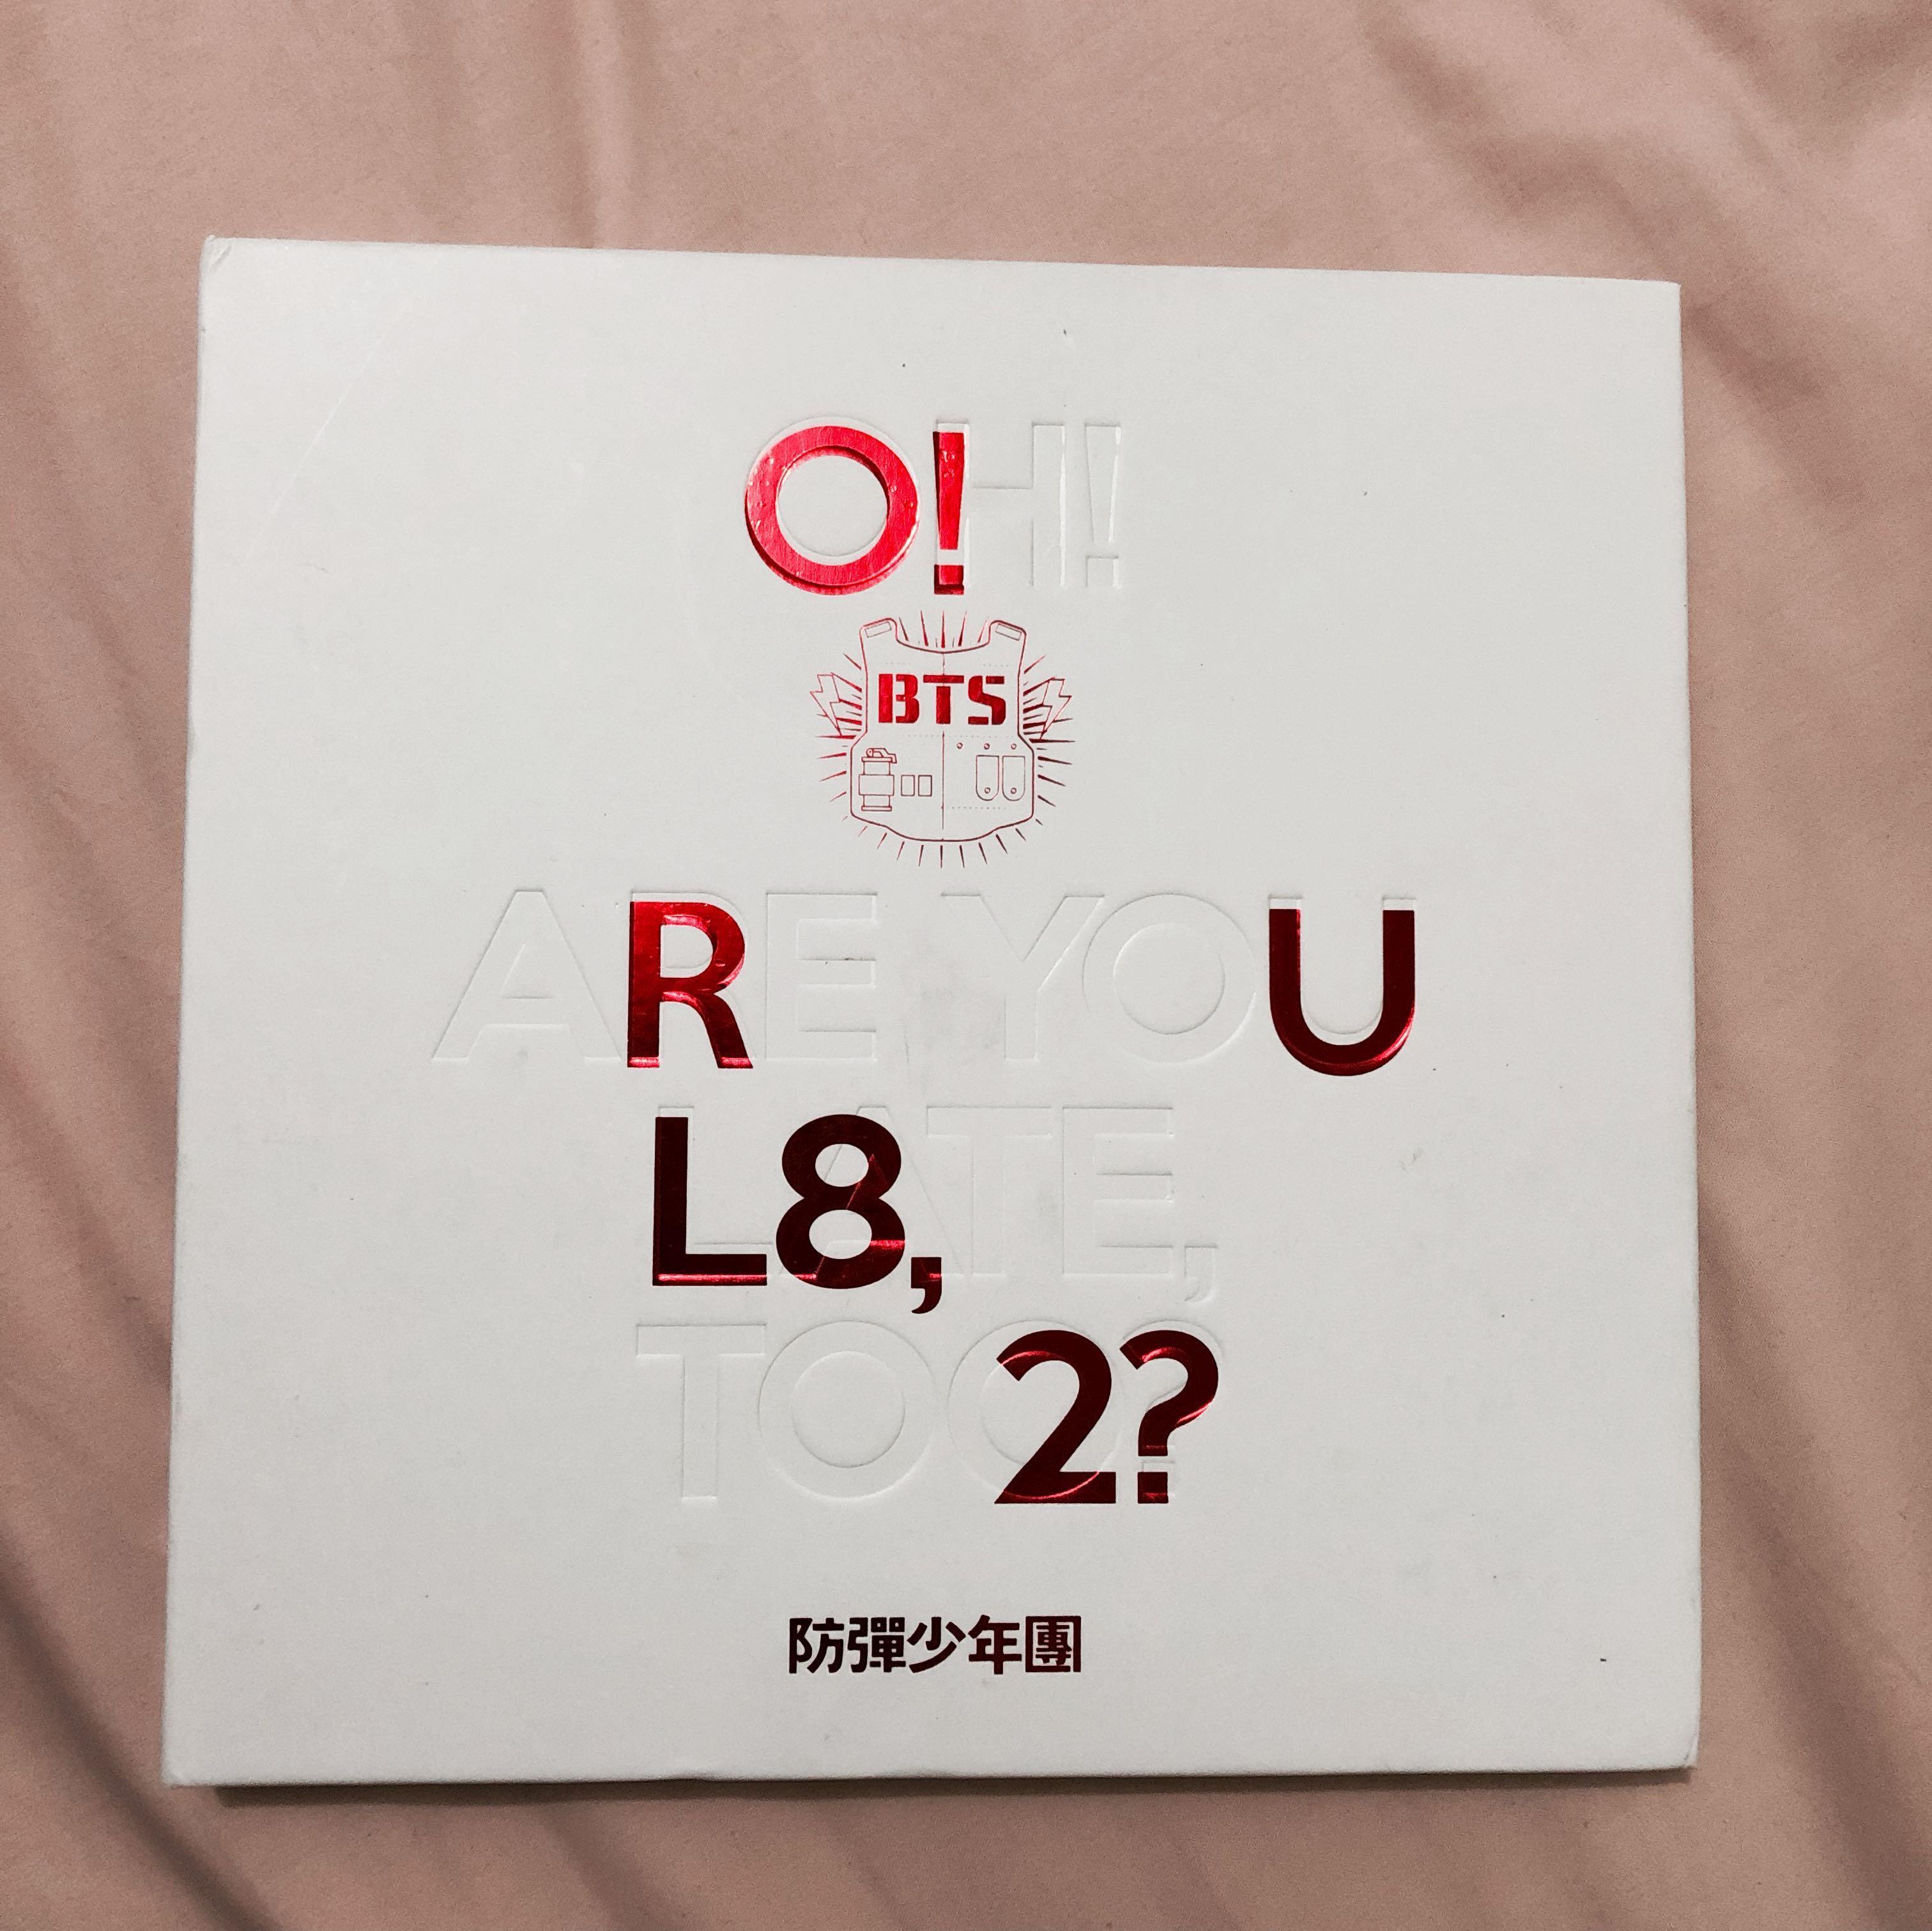 O Rul8 2 Bts Album Entertainment K Wave On Carousell